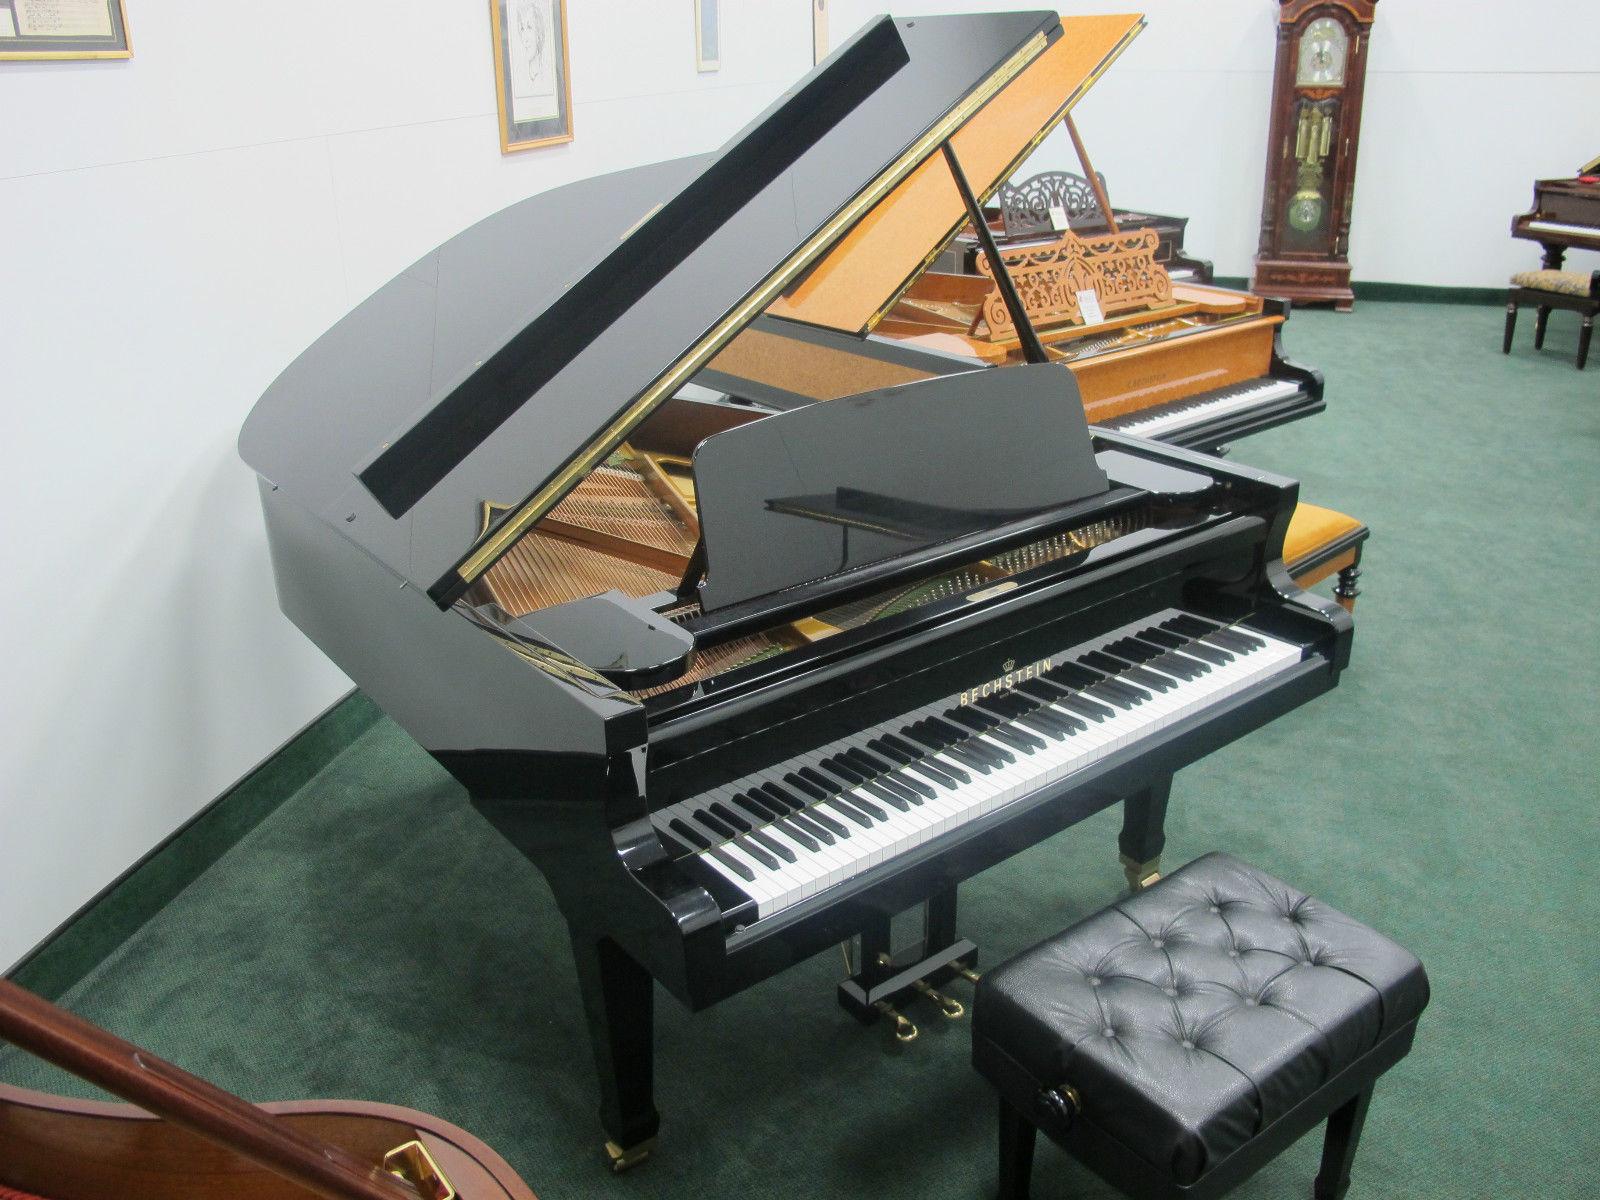 FOR SALE: YAMAHA C6 CONVERSORY GRAND PIANO----10000$ - Keys